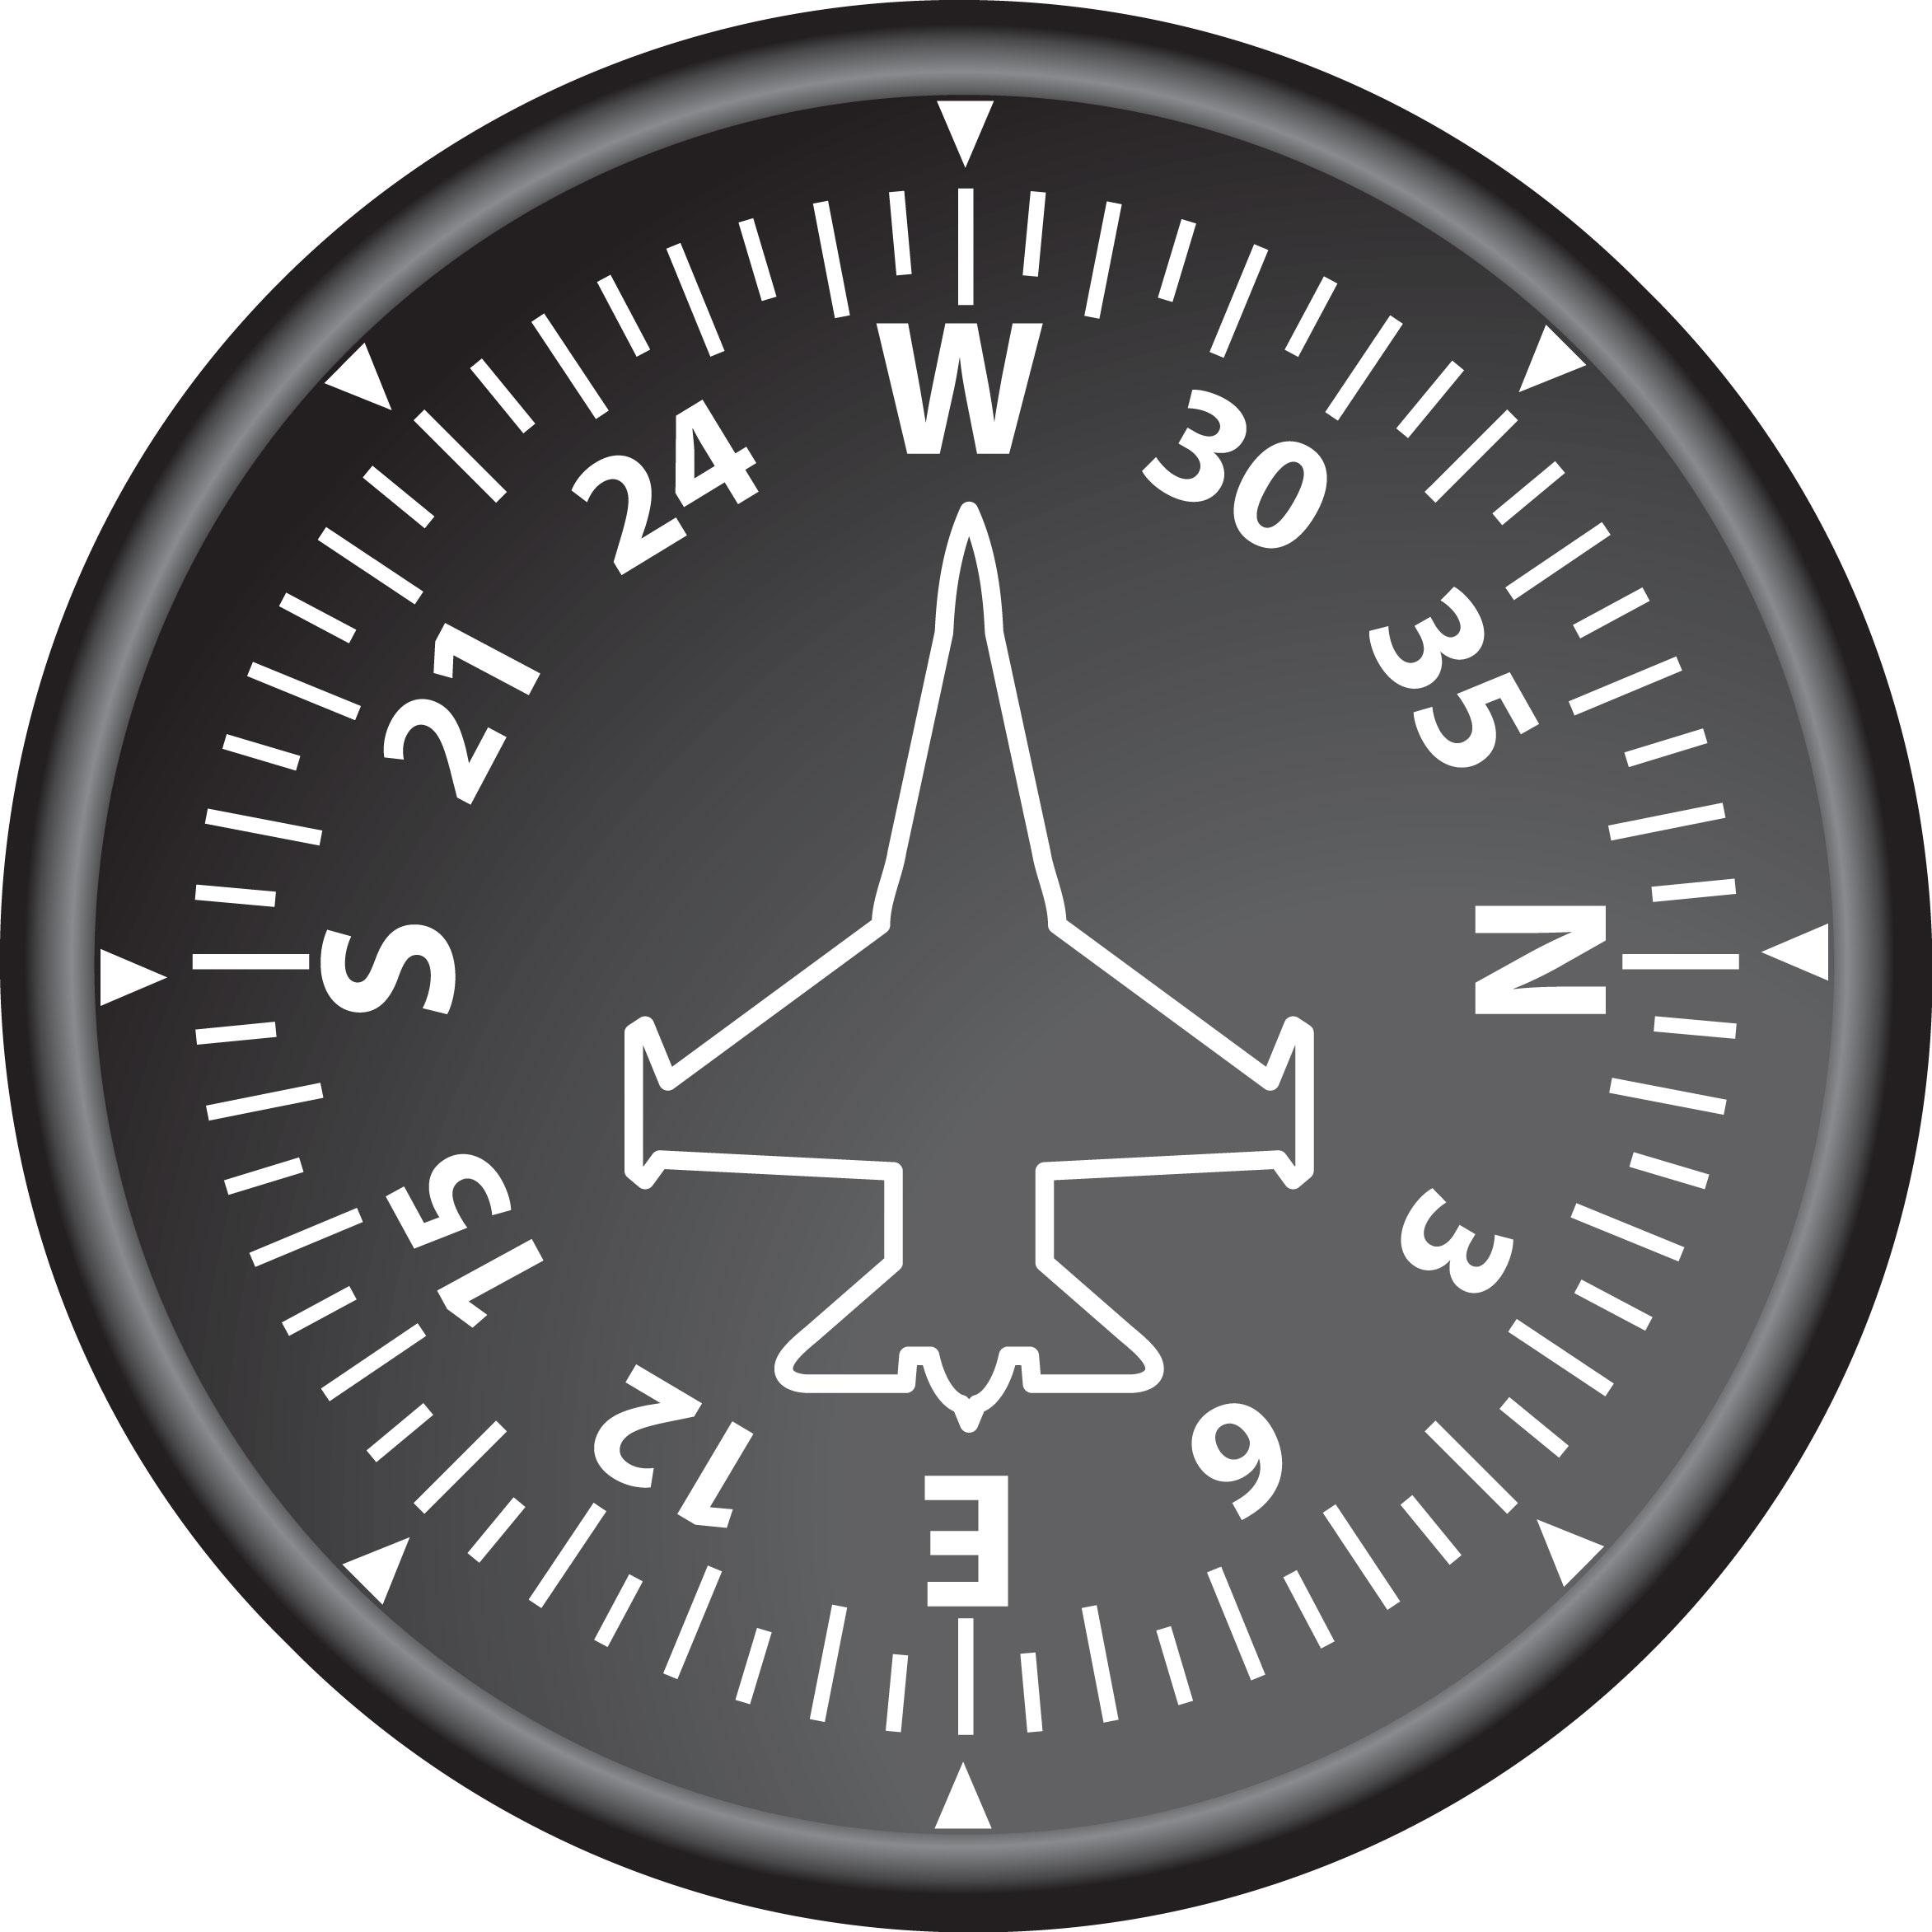 Heading Indicator.jpg (2345×2345).